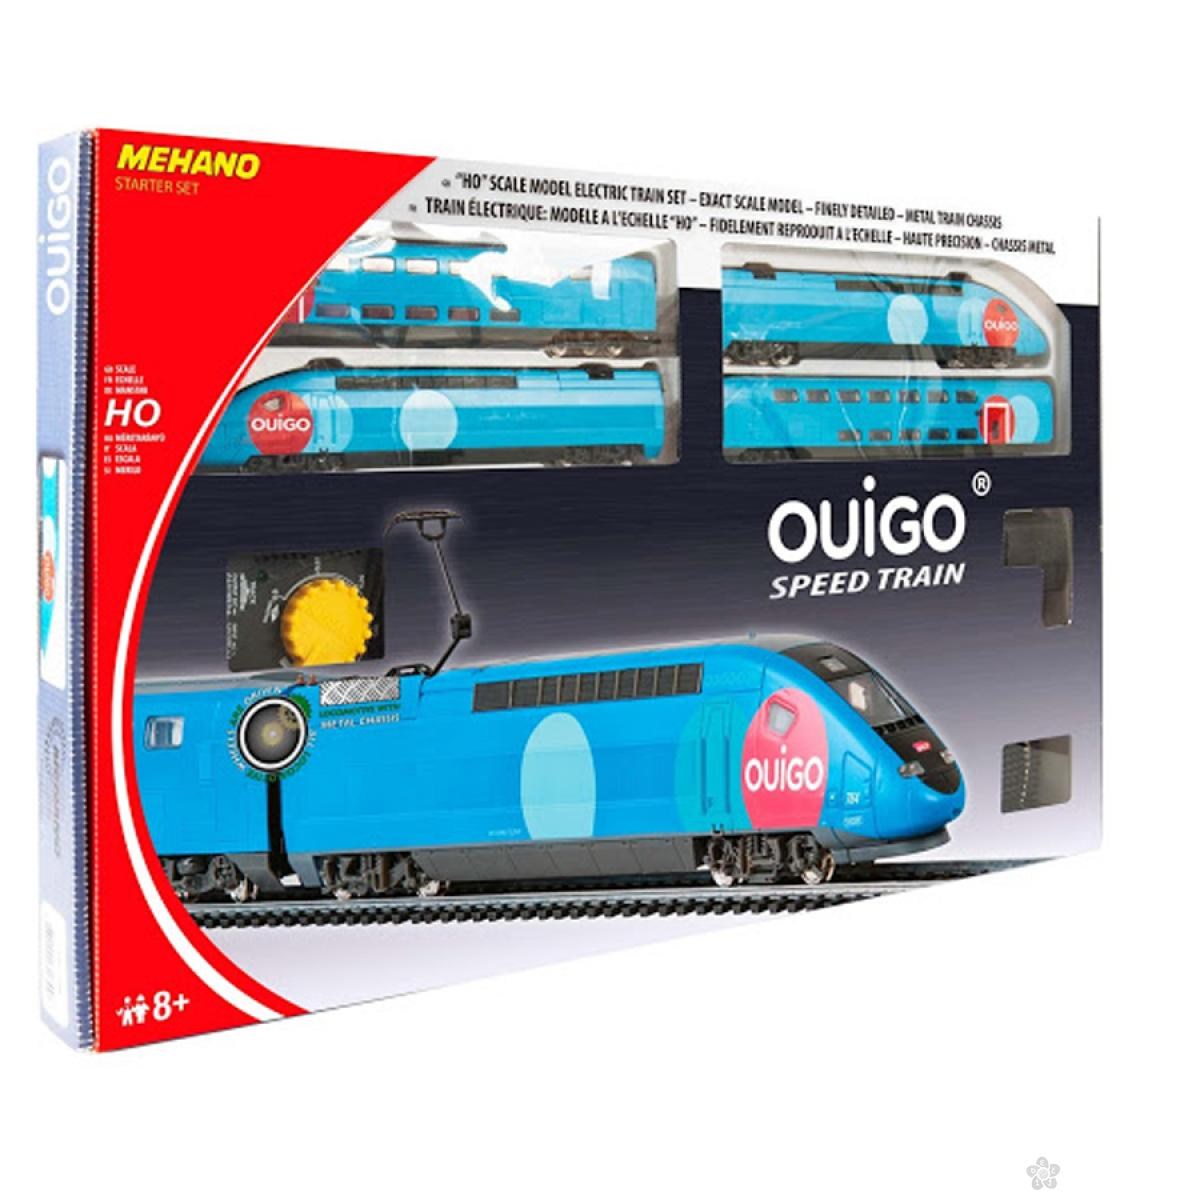 Voz Mehano garnutura TGV Ouigo T114